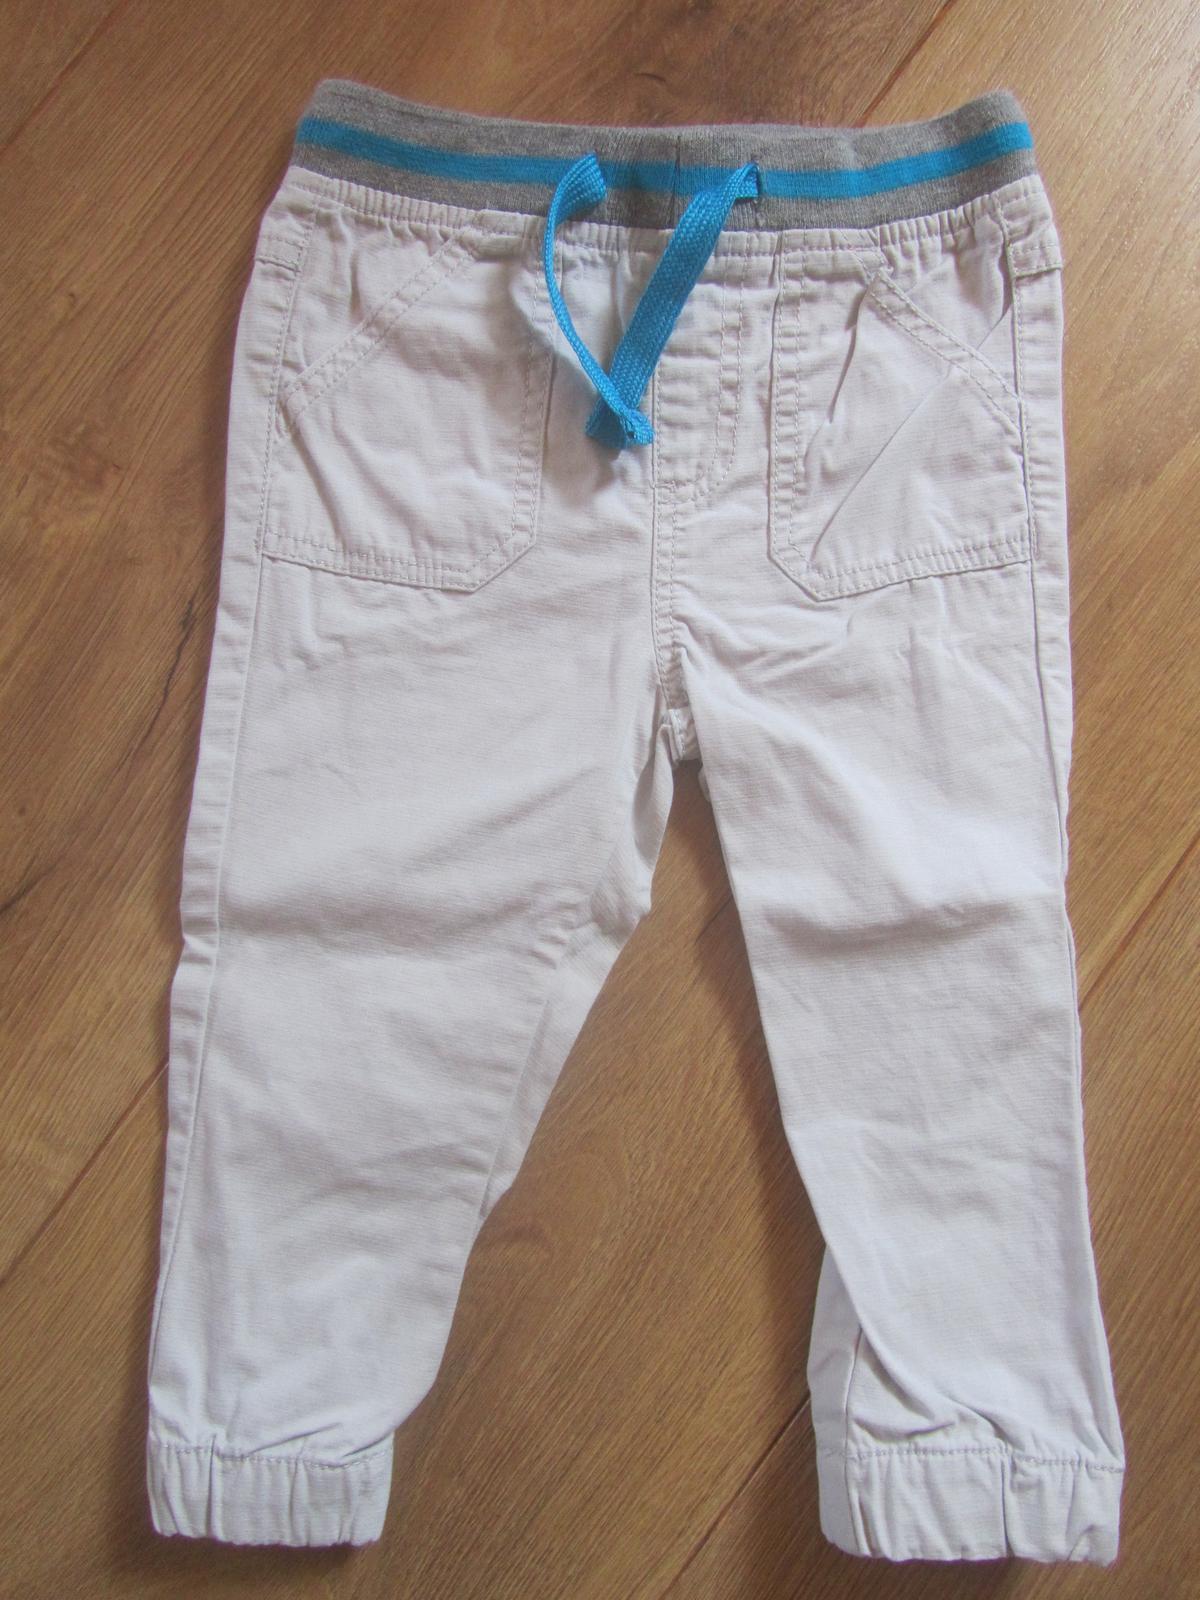 Kremove nohavice Pepco 92 nenosene - Obrázok č. 1